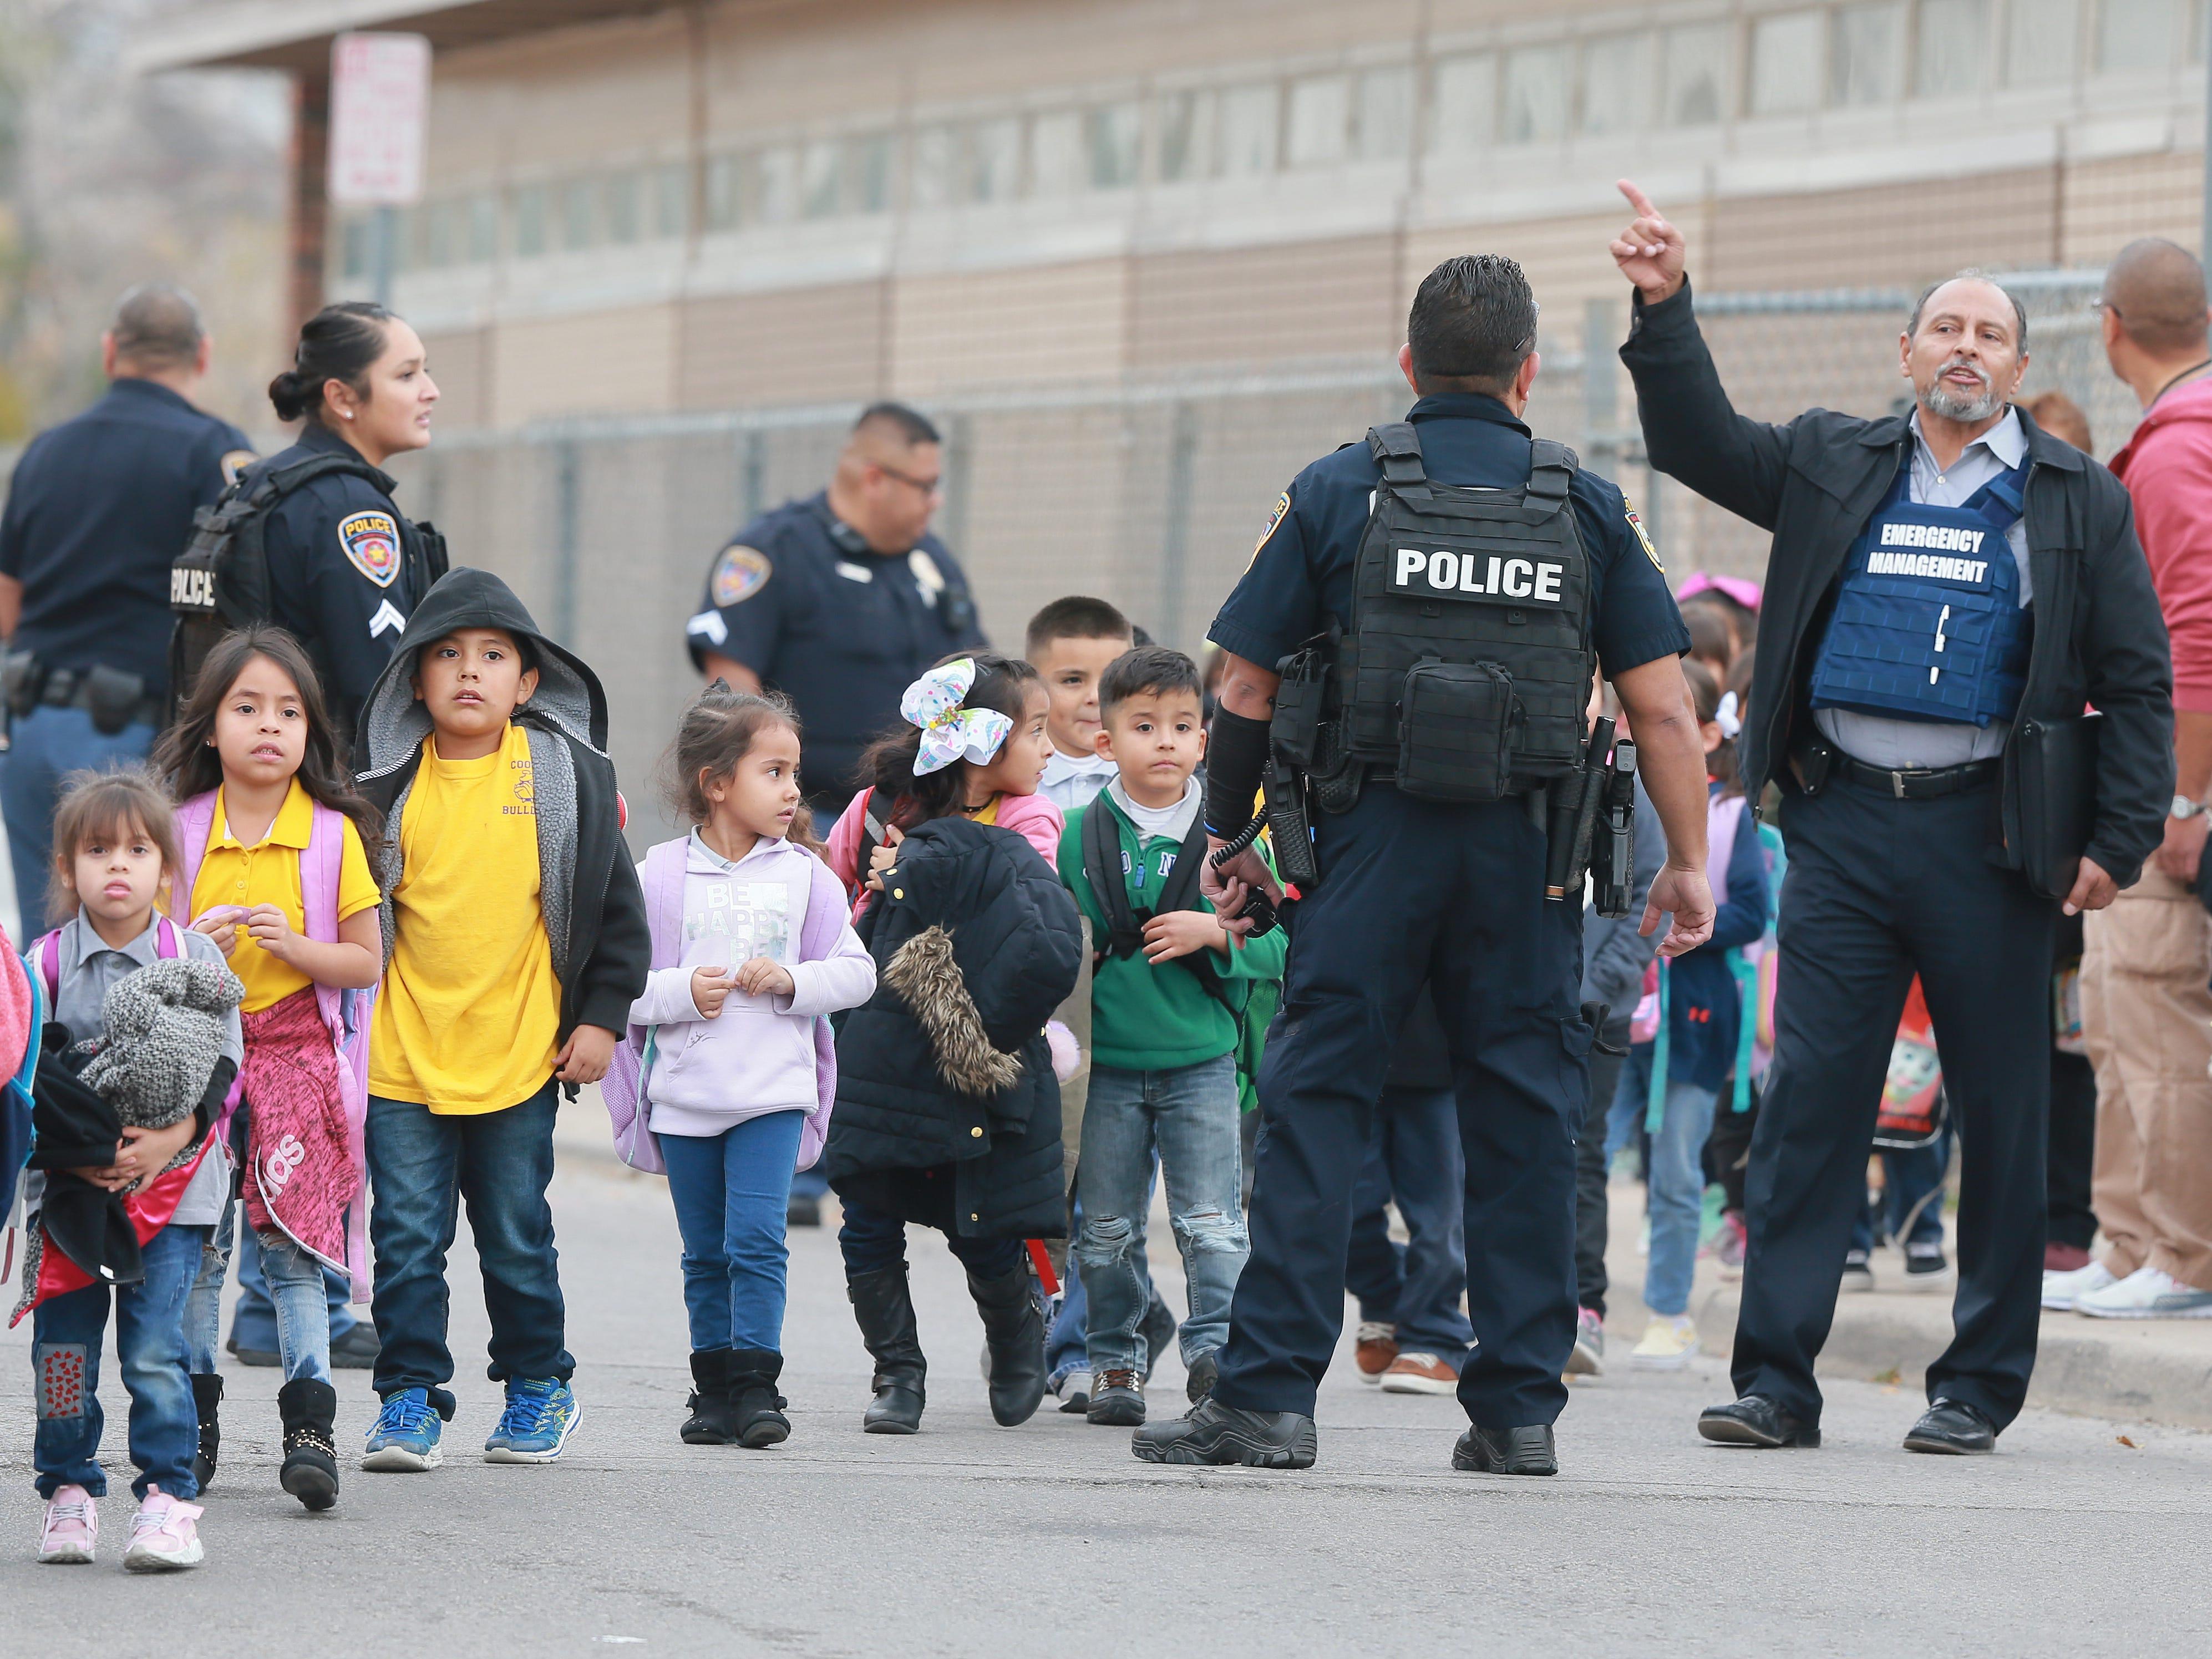 El Paso police officer shot, taken to hospital; suspect sought